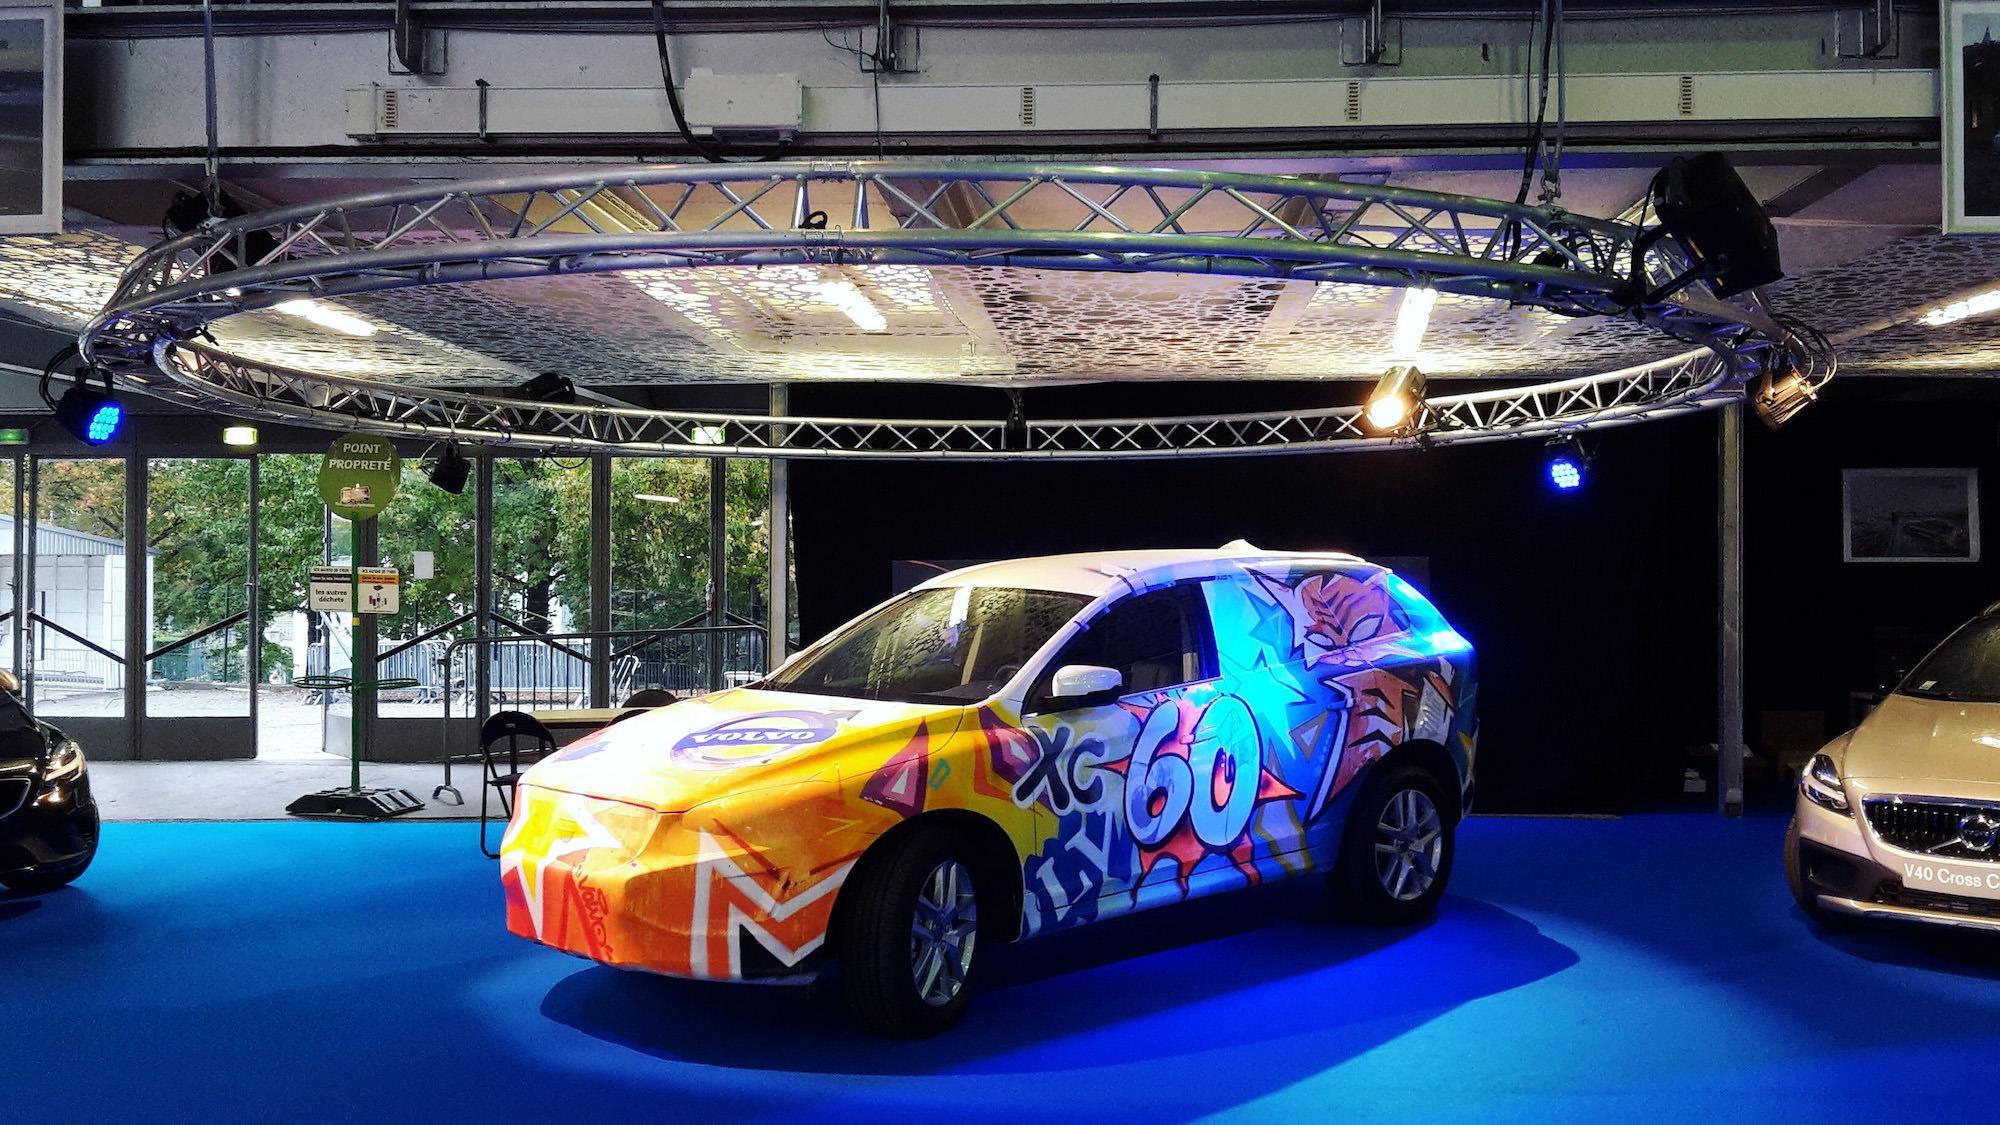 custom-car-performance-artistique-voiture-graffiti-tag